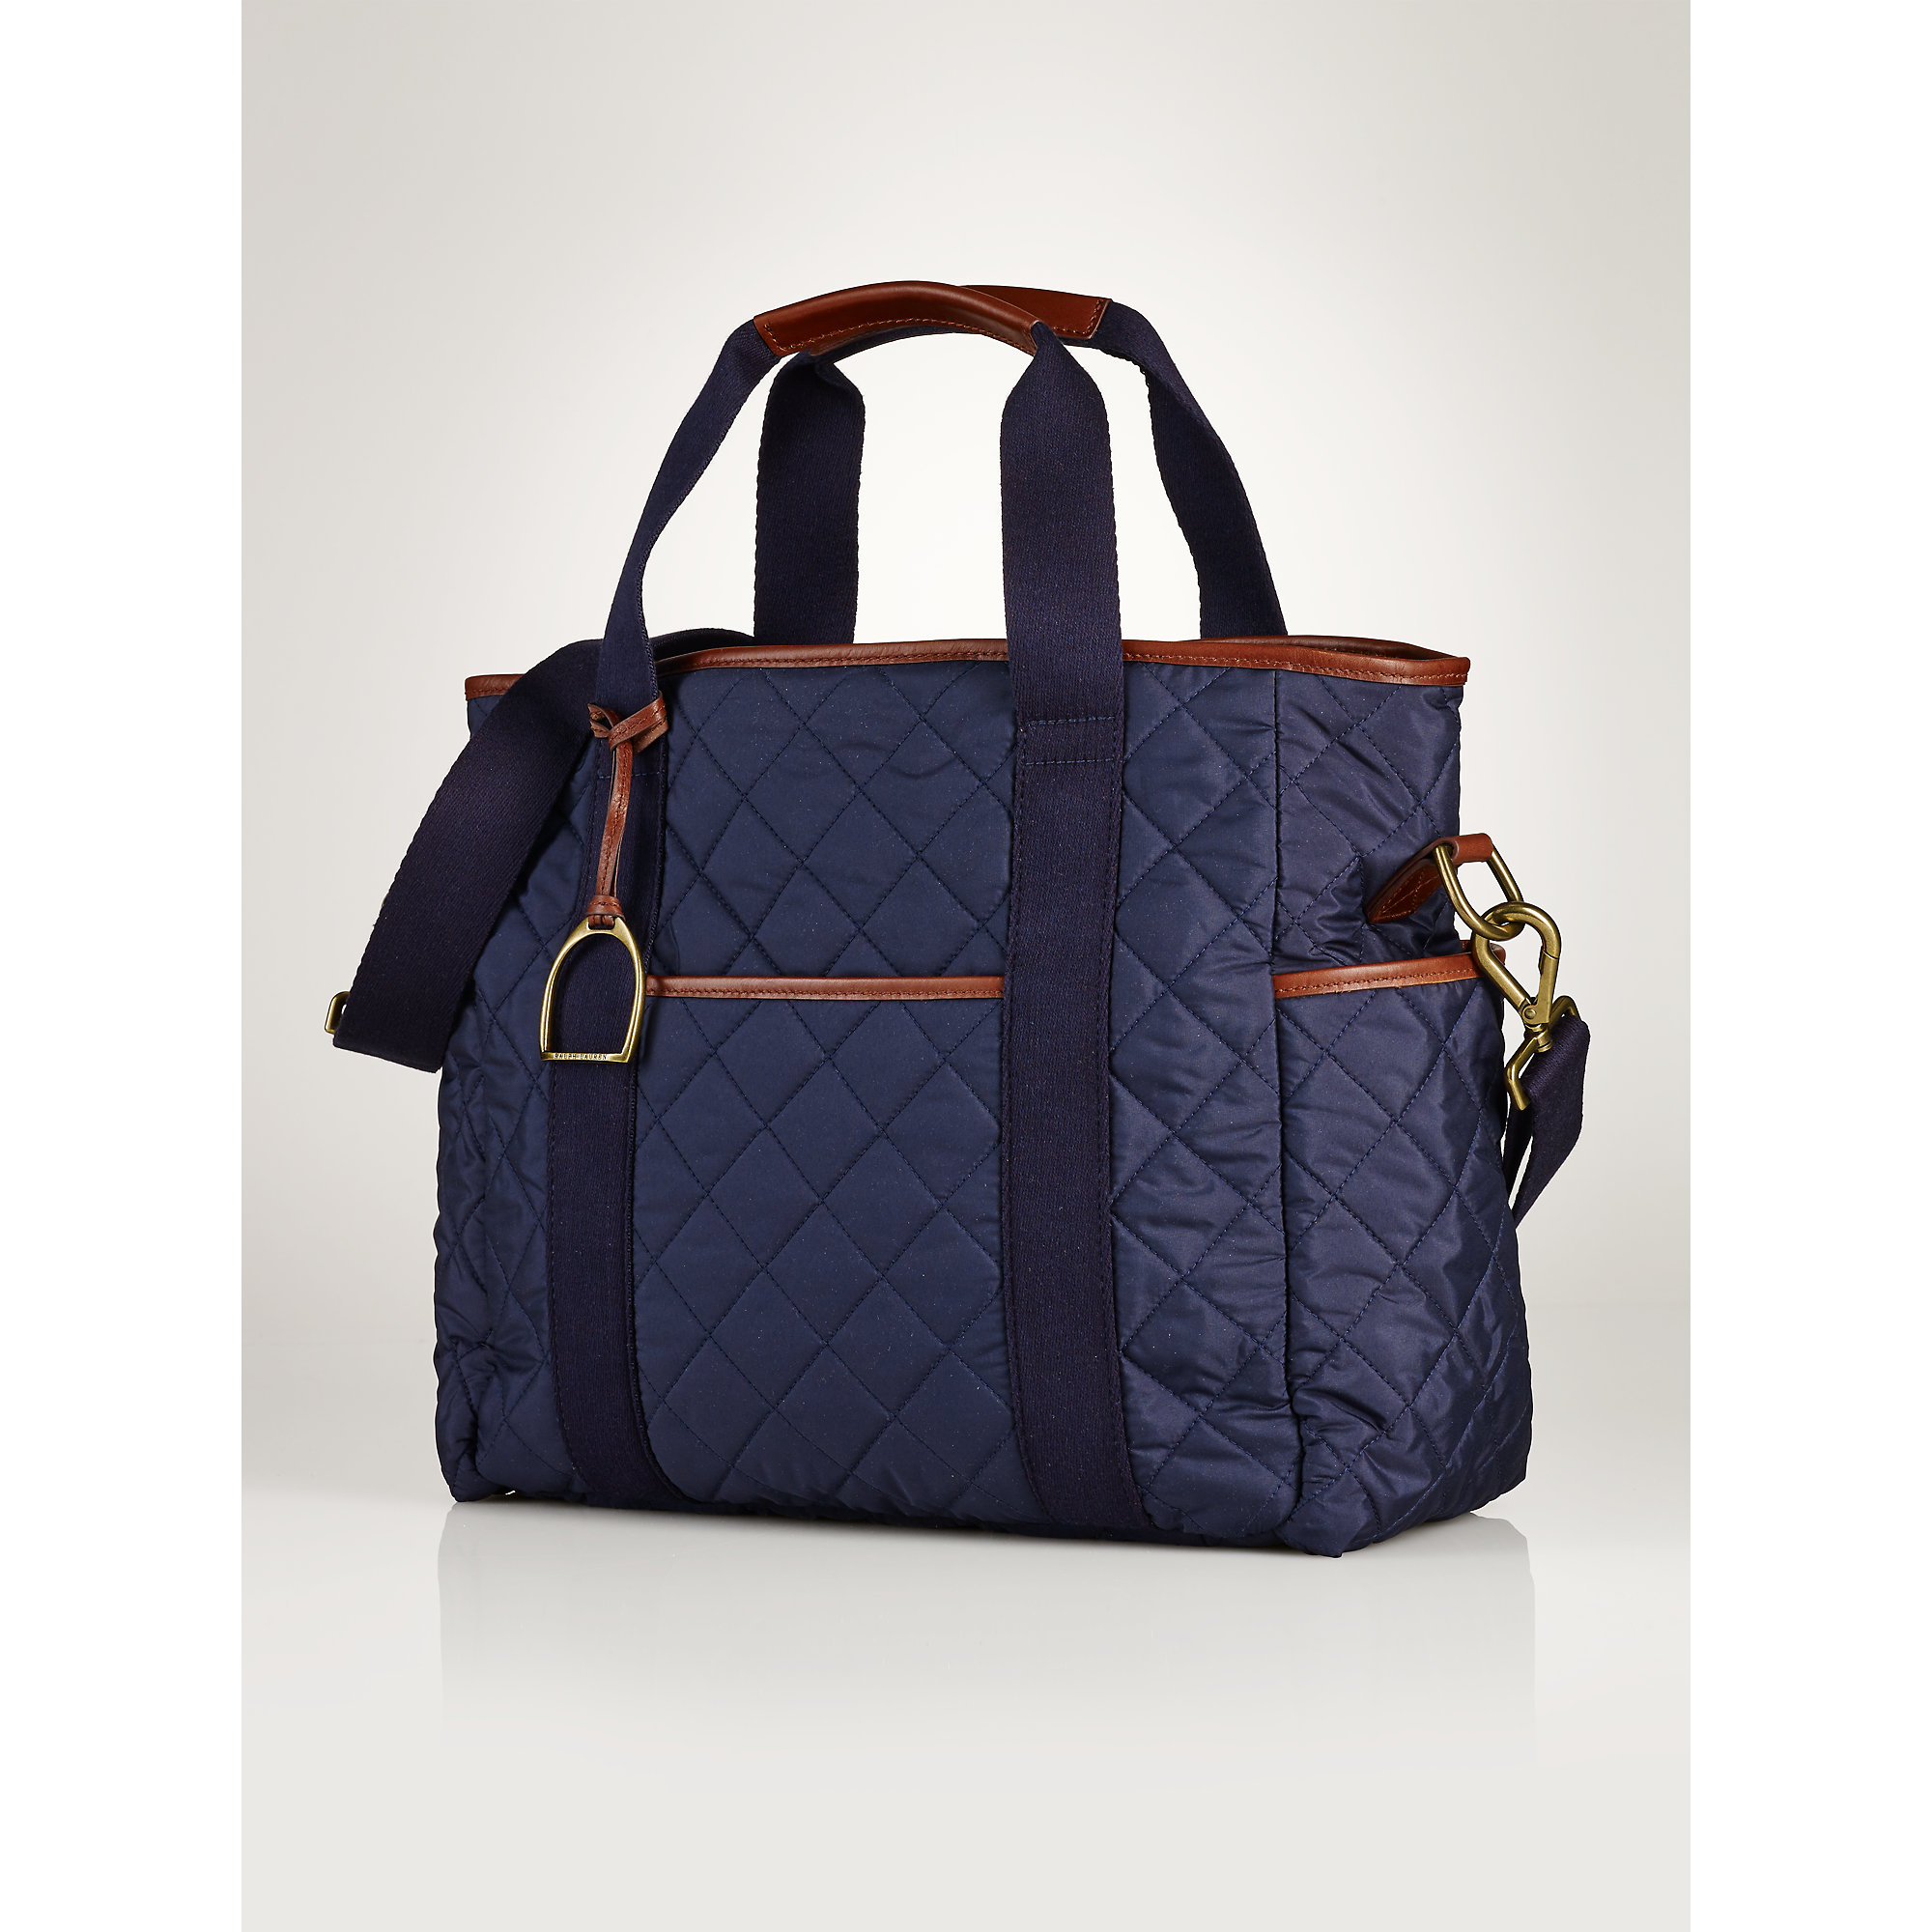 6854f6ddd949 Lyst - Ralph Lauren Diaper Bag in Blue